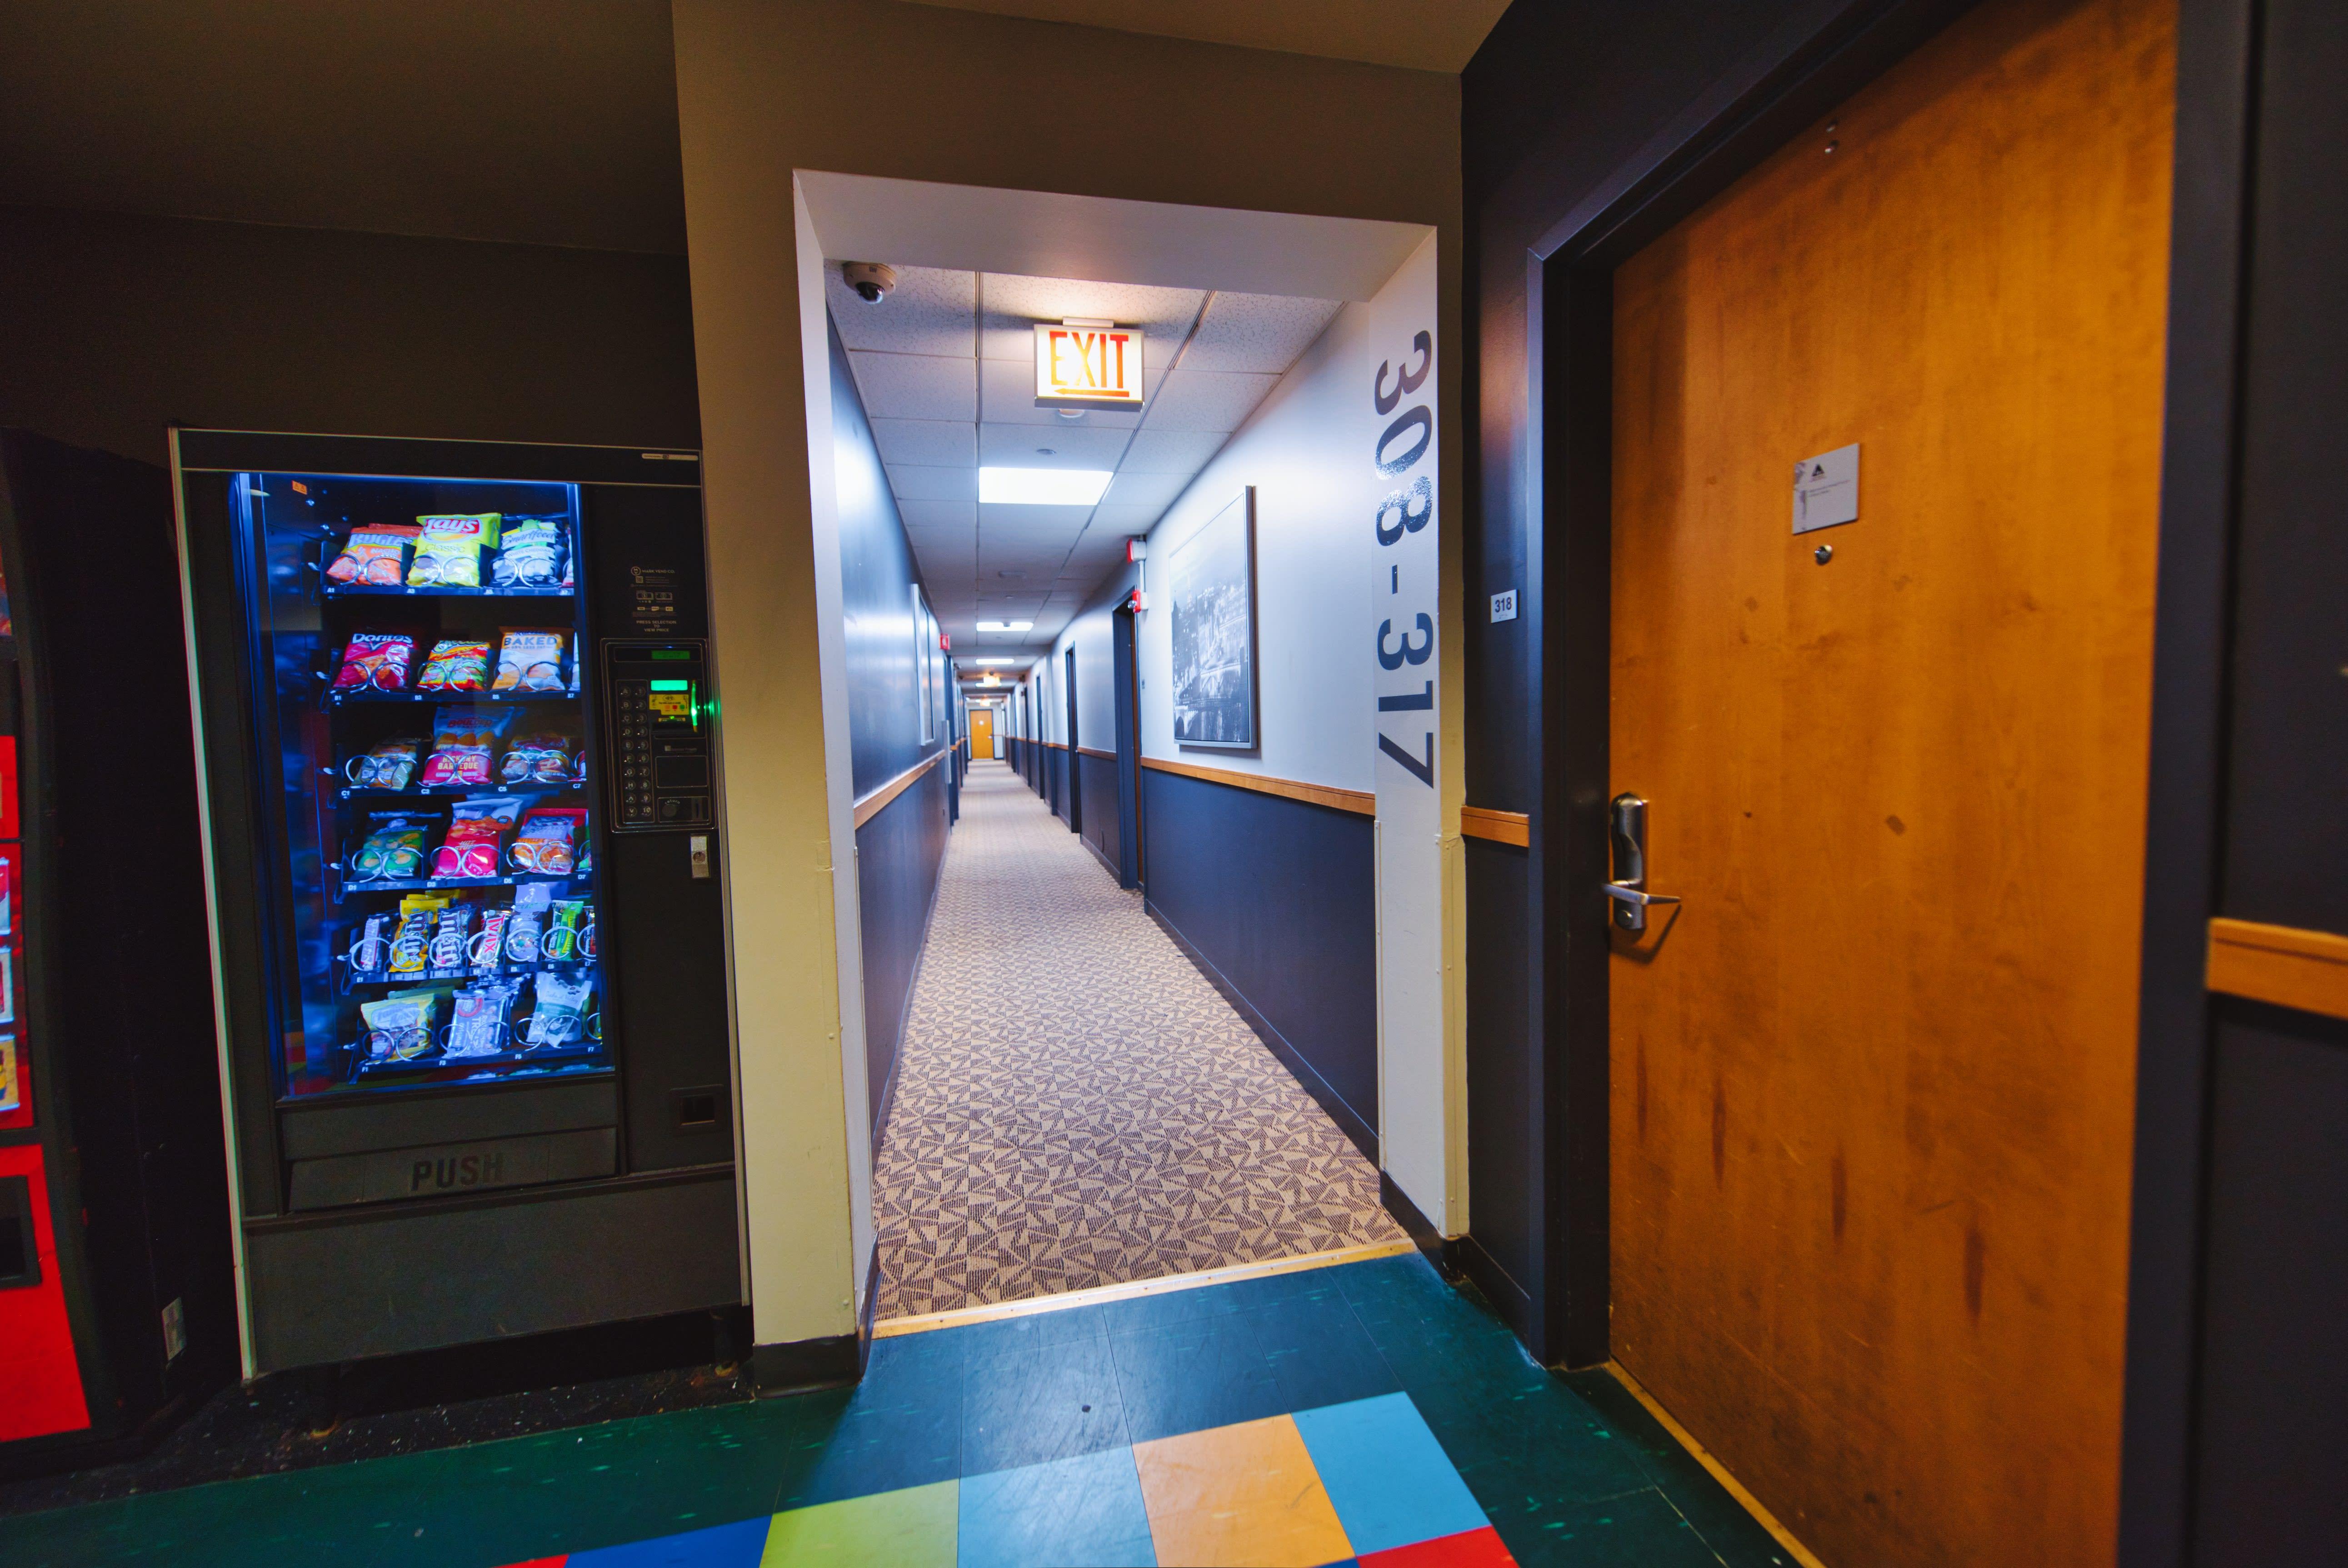 HOSTEL - HI Chicago, The J.Ira & Nicki Harris Family Hostel